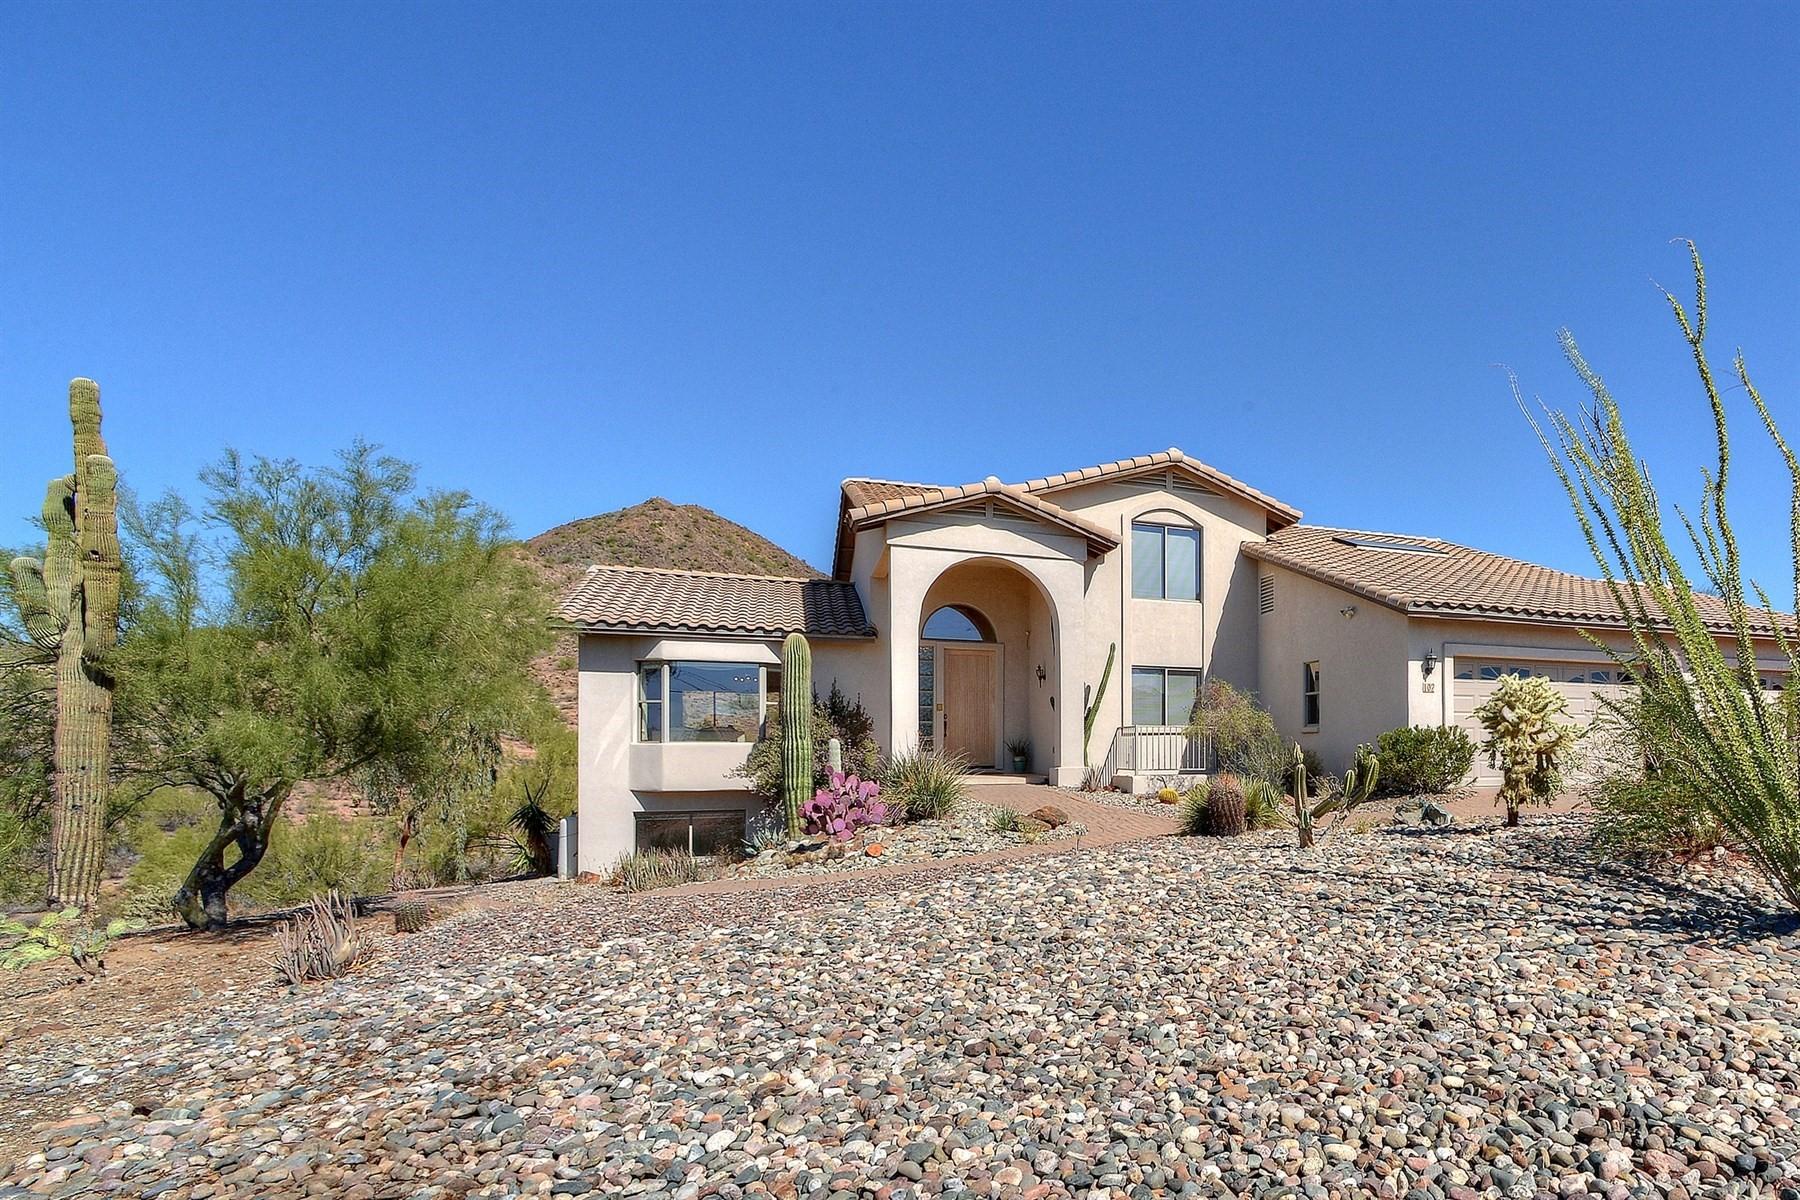 Частный односемейный дом для того Продажа на Lovely home with gorgeous mountain views 102 E Briles Rd Phoenix, Аризона, 85085 Соединенные Штаты